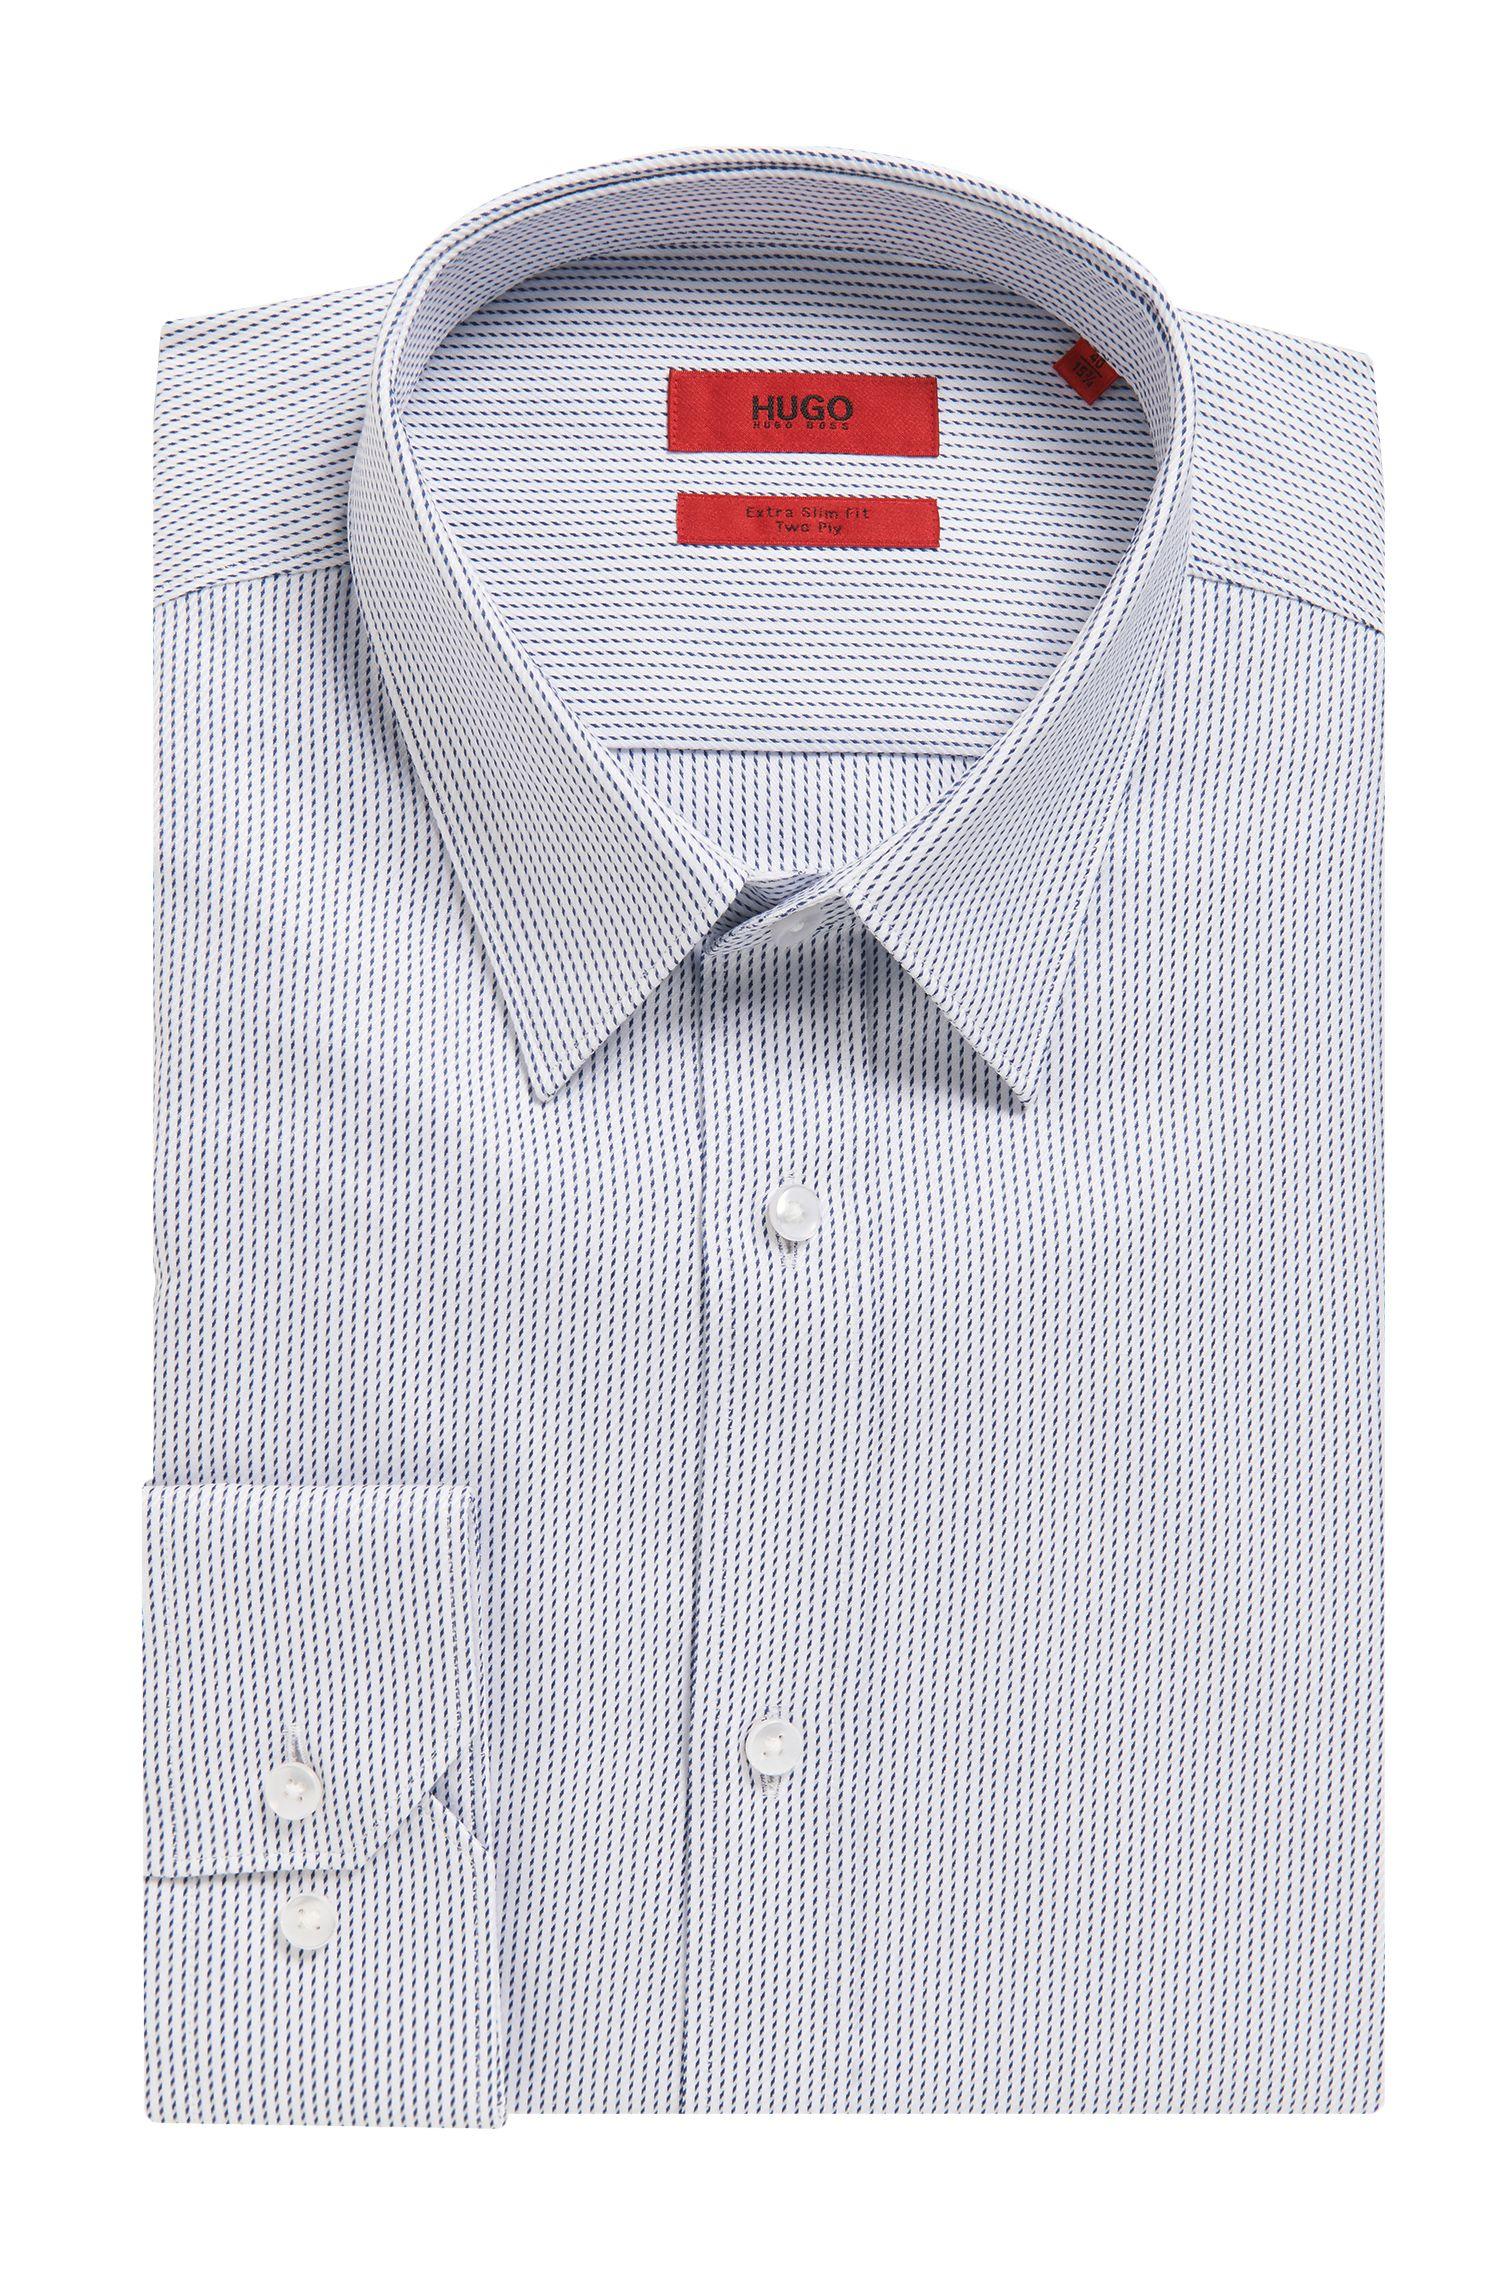 Microdot Cotton Button Down Shirt, Extra Slim Fit | Elisha